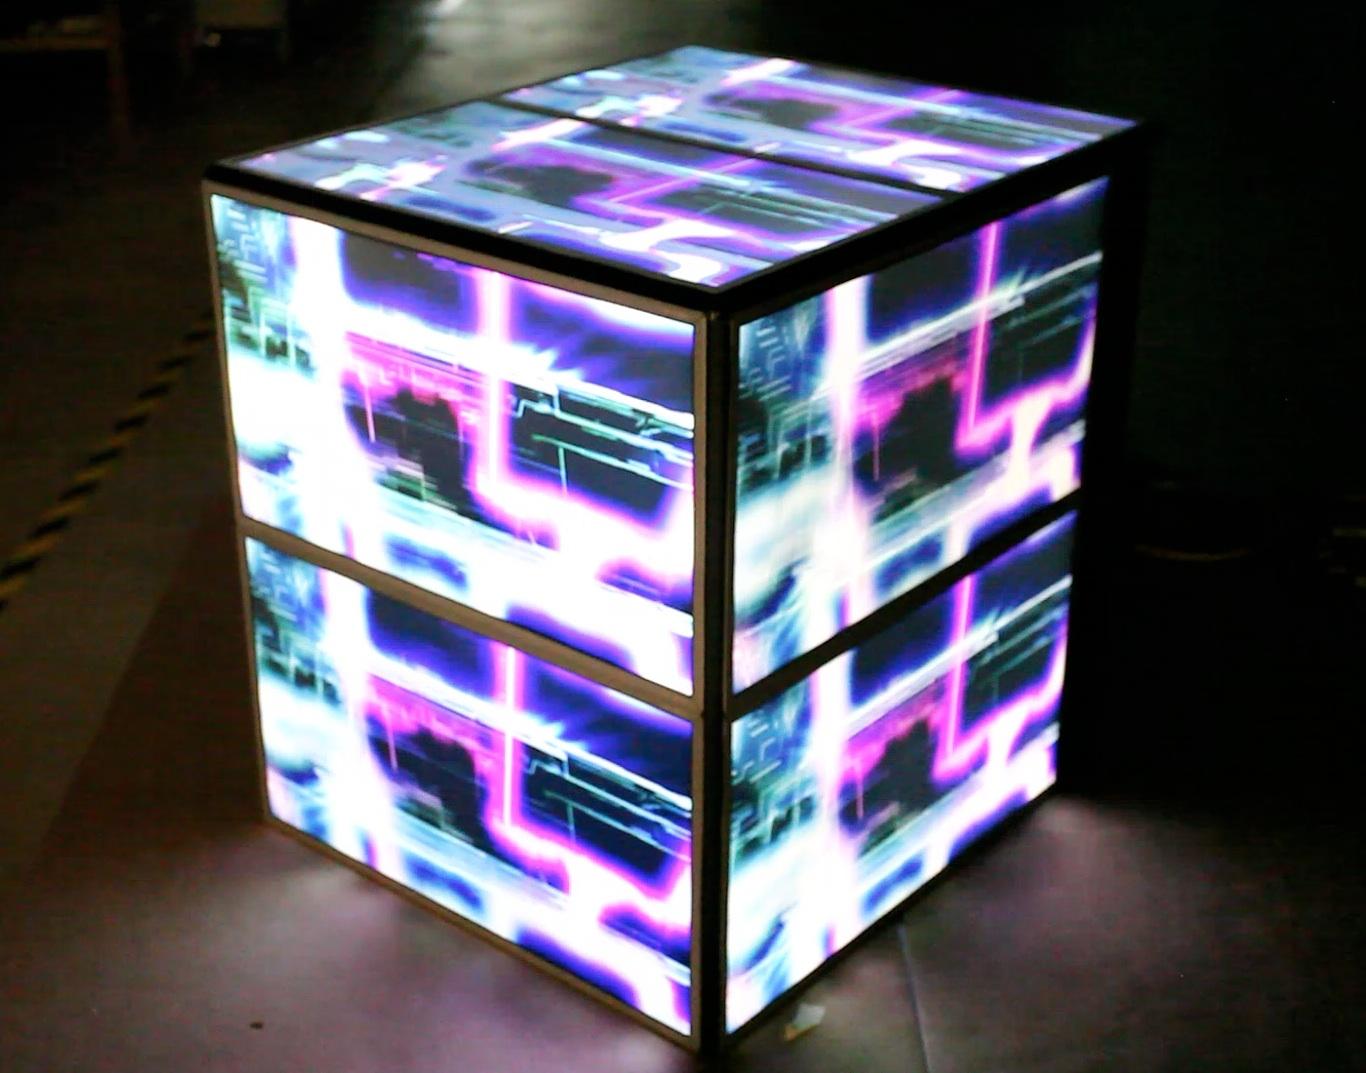 The-Cube-10-Sep-2013.jpg